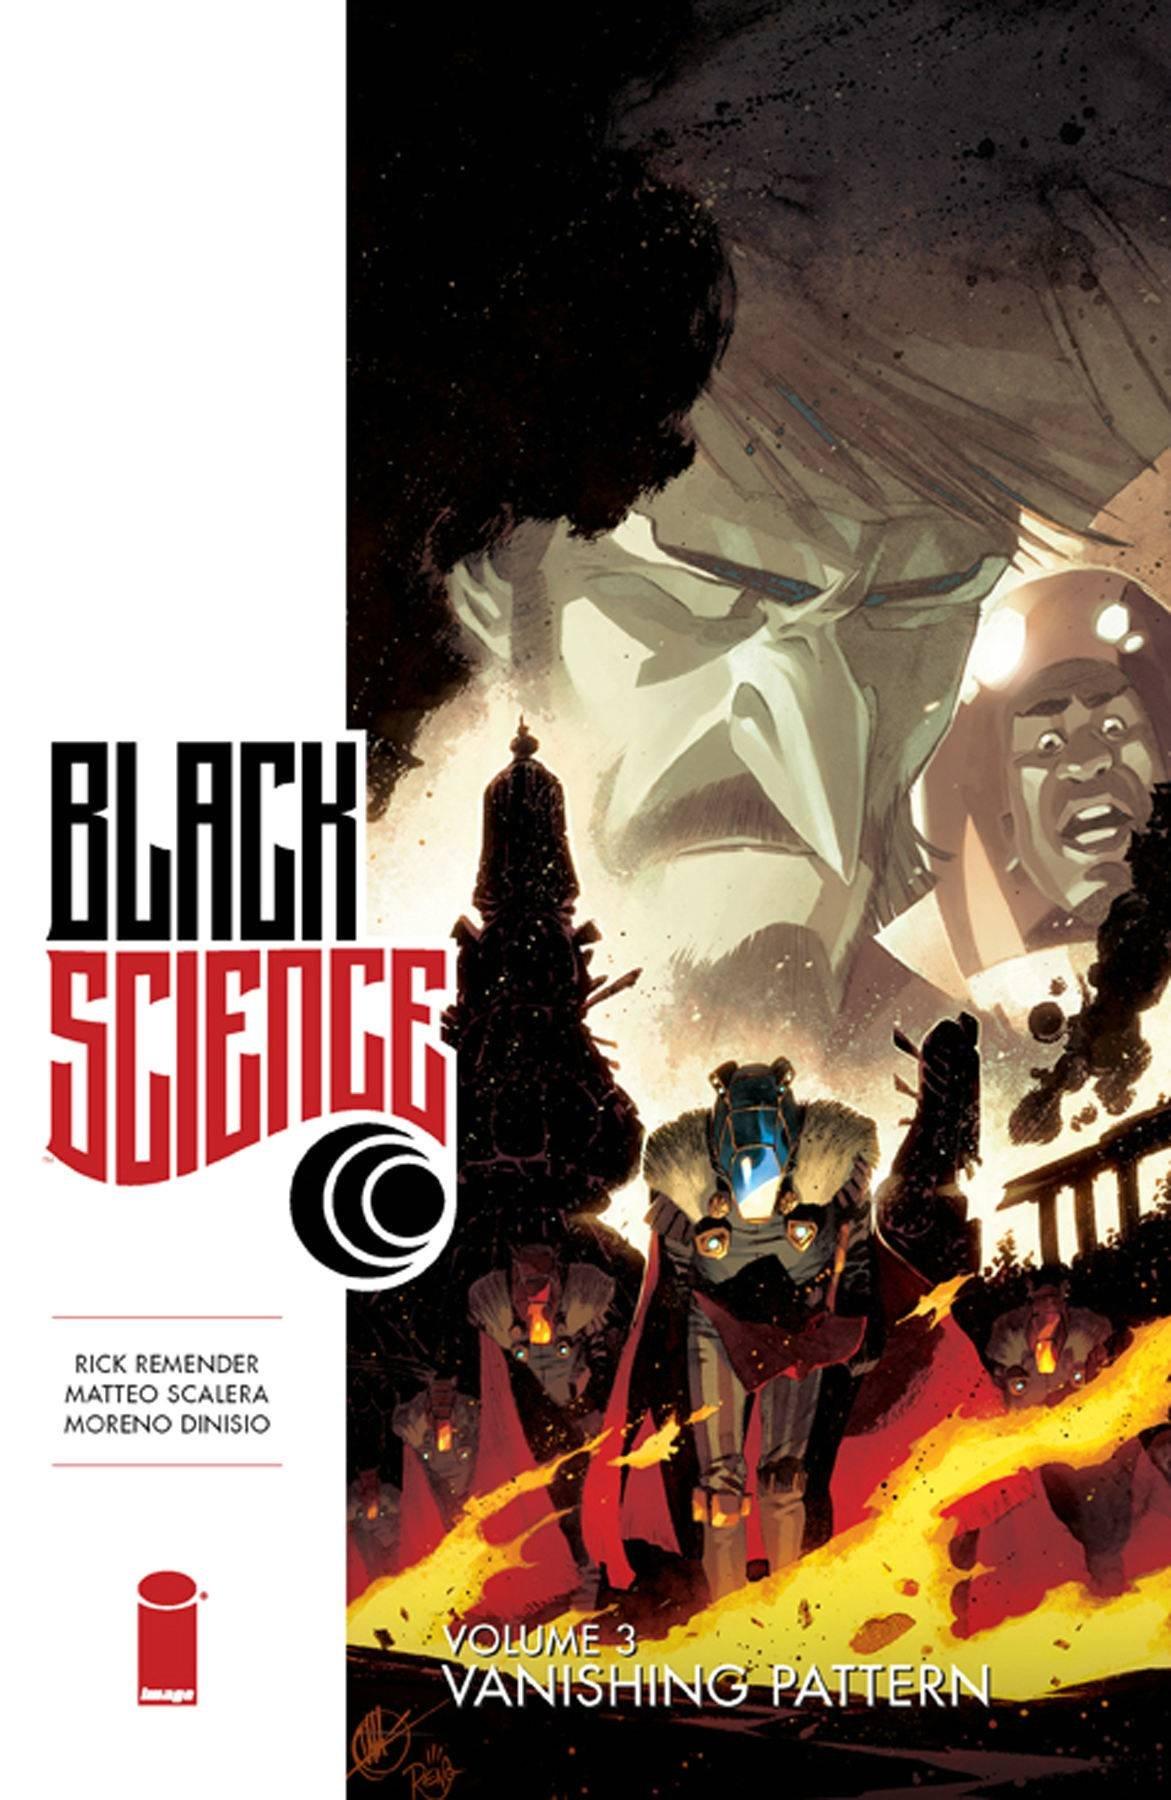 Black Science Volume 3: Vanishing Pattern